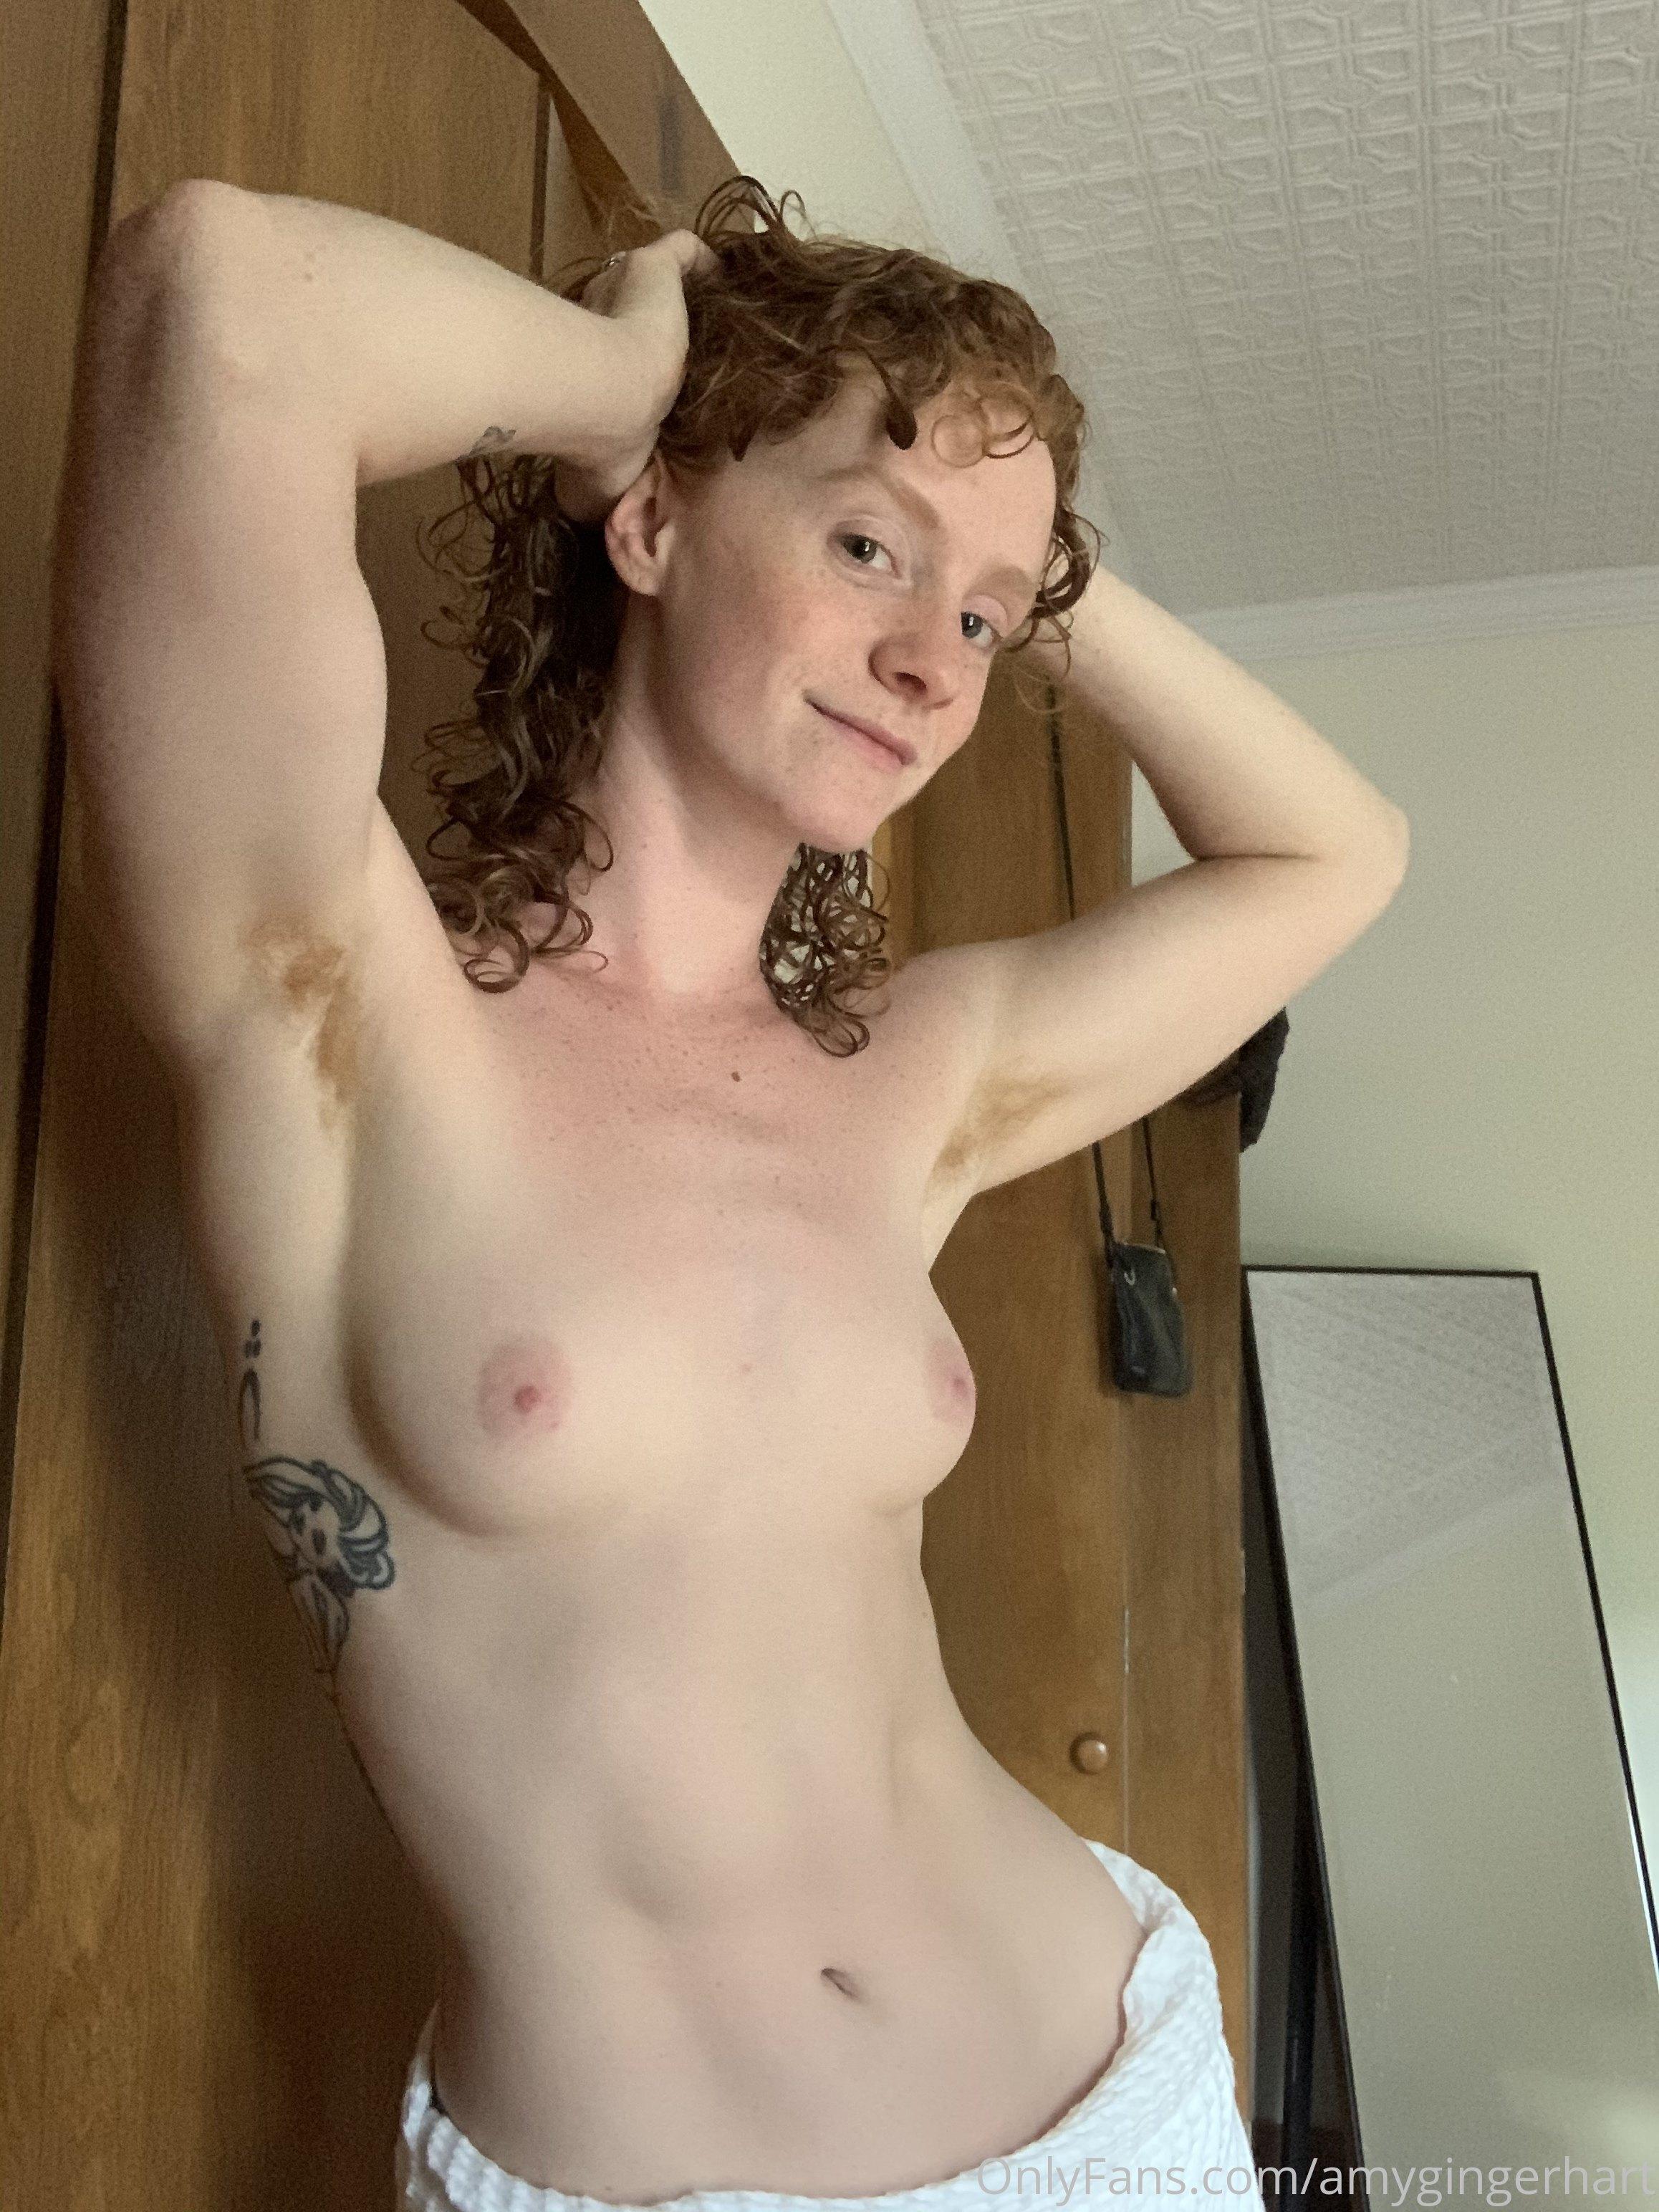 Amy Hart, Amygingerhart, Onlyfans 0320